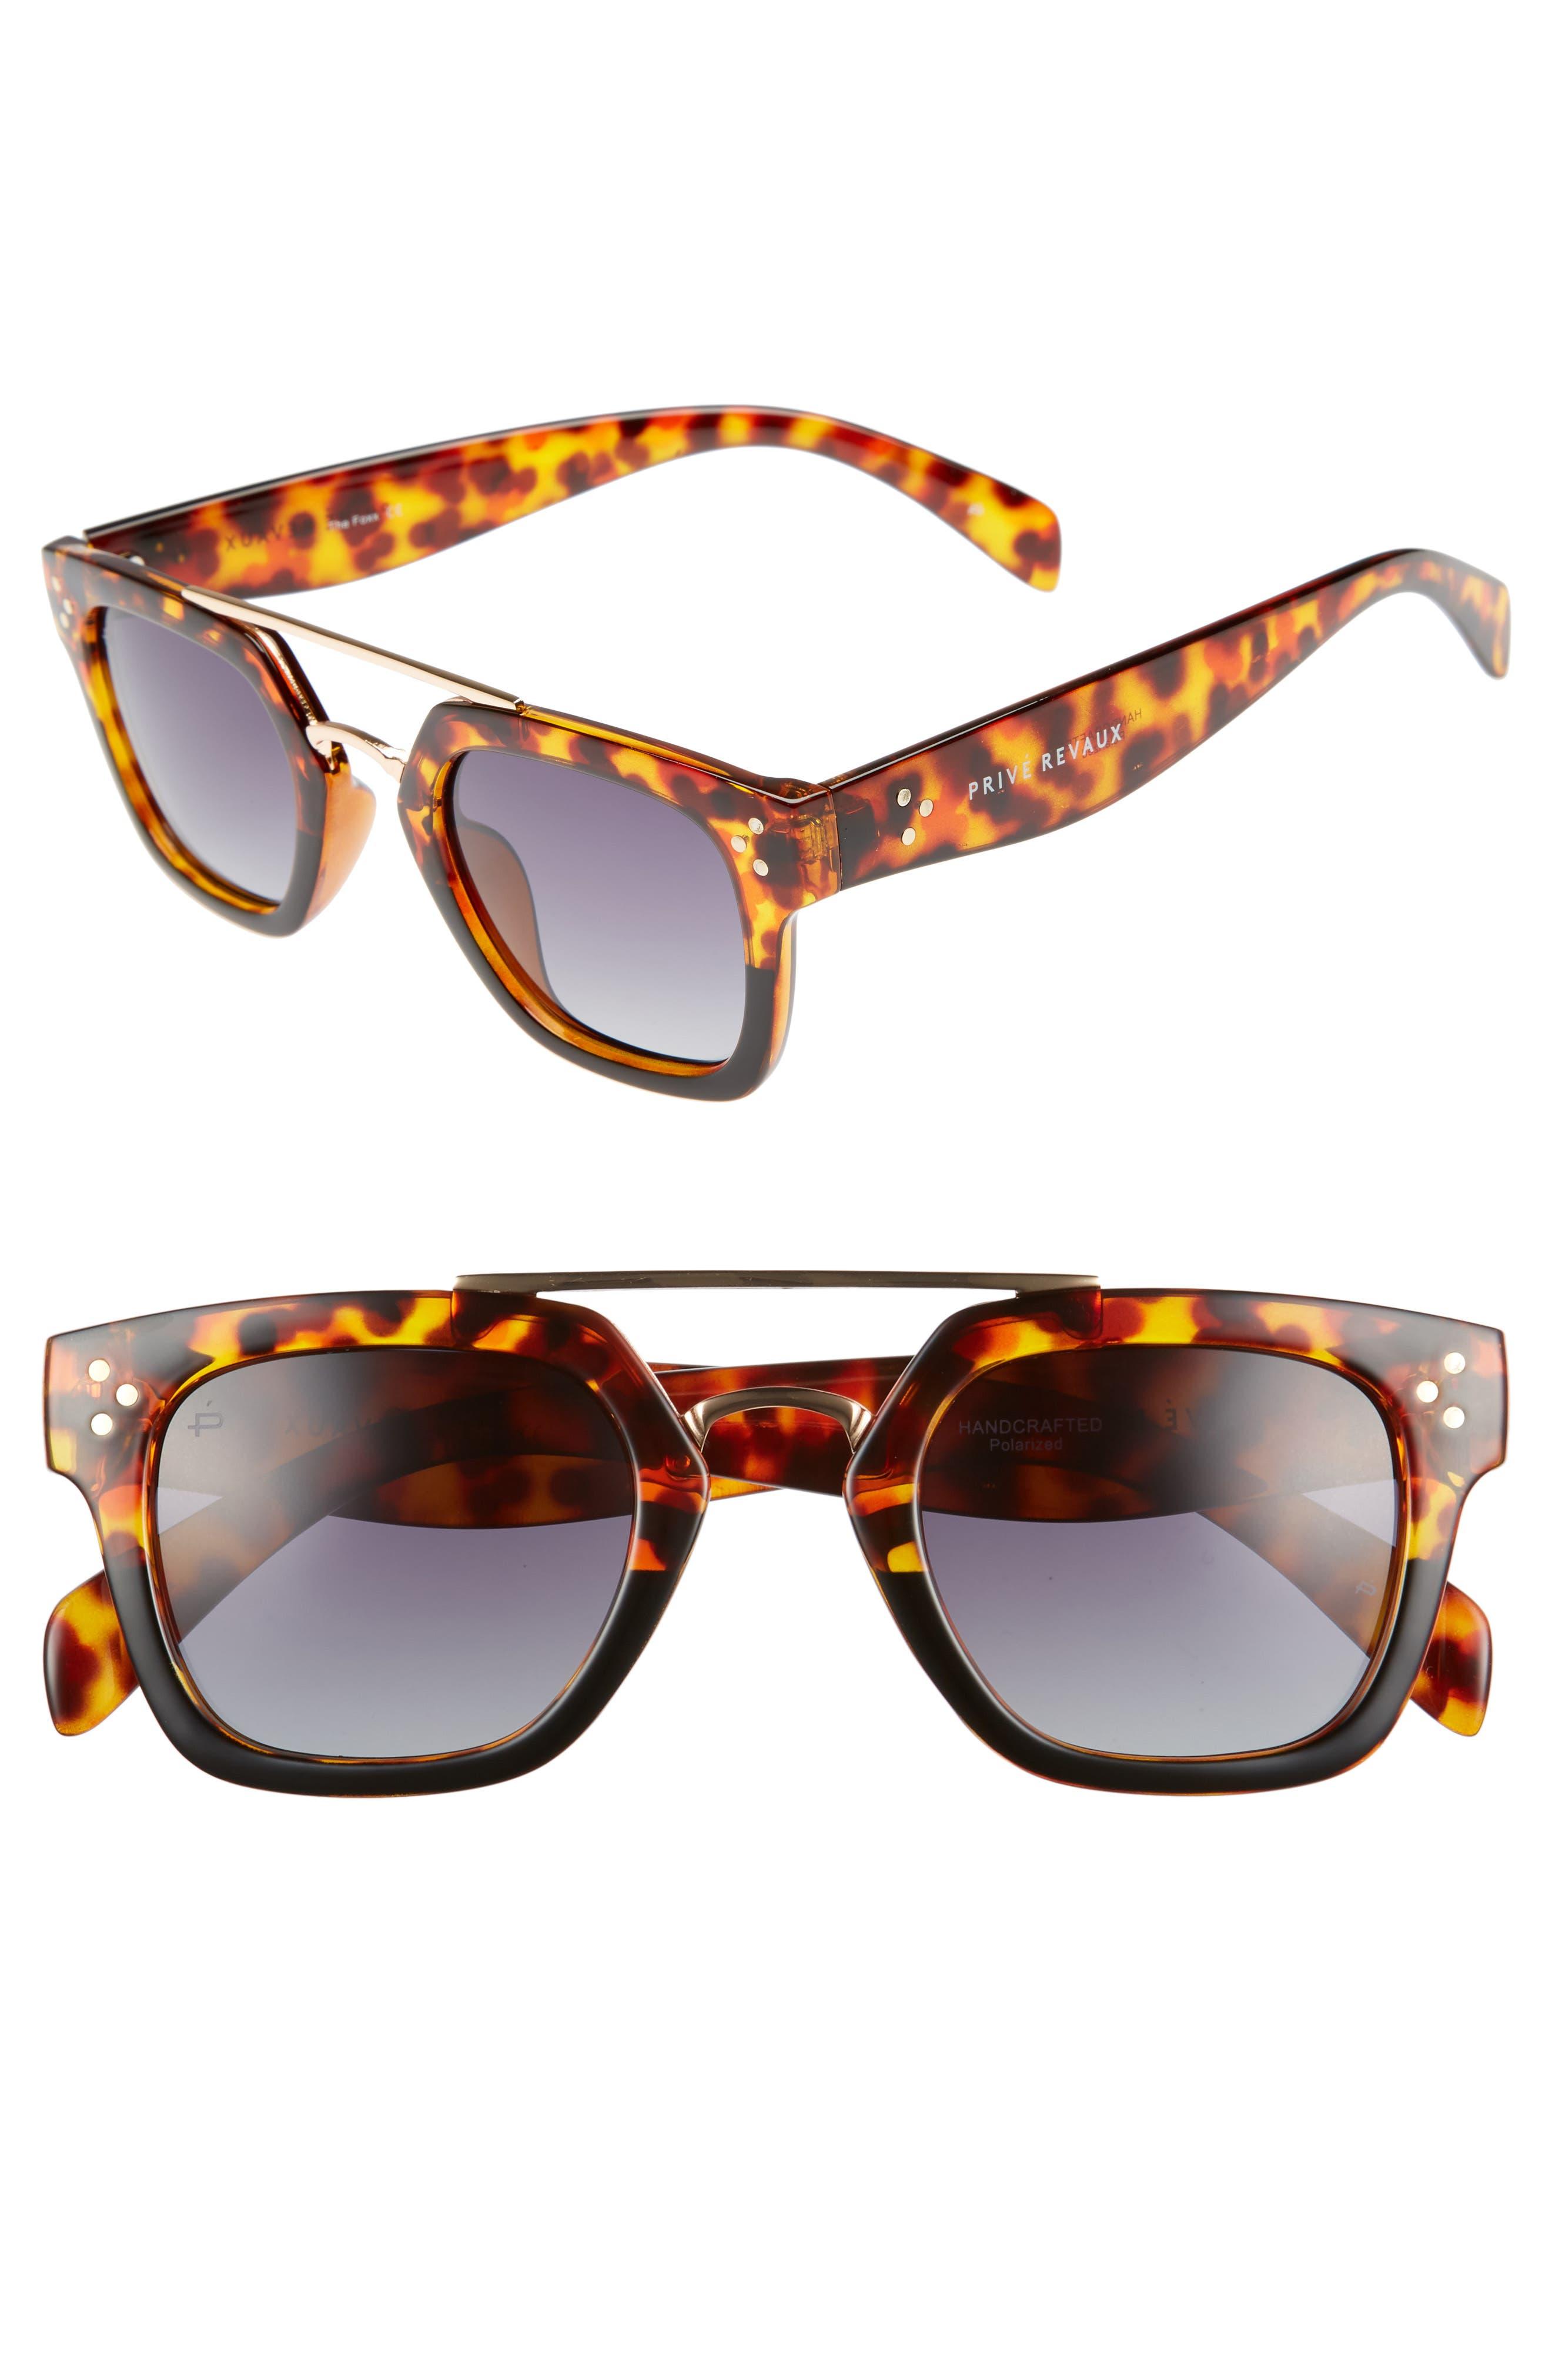 Alternate Image 1 Selected - Privé Revaux The Foxx 49mm Aviator Sunglasses